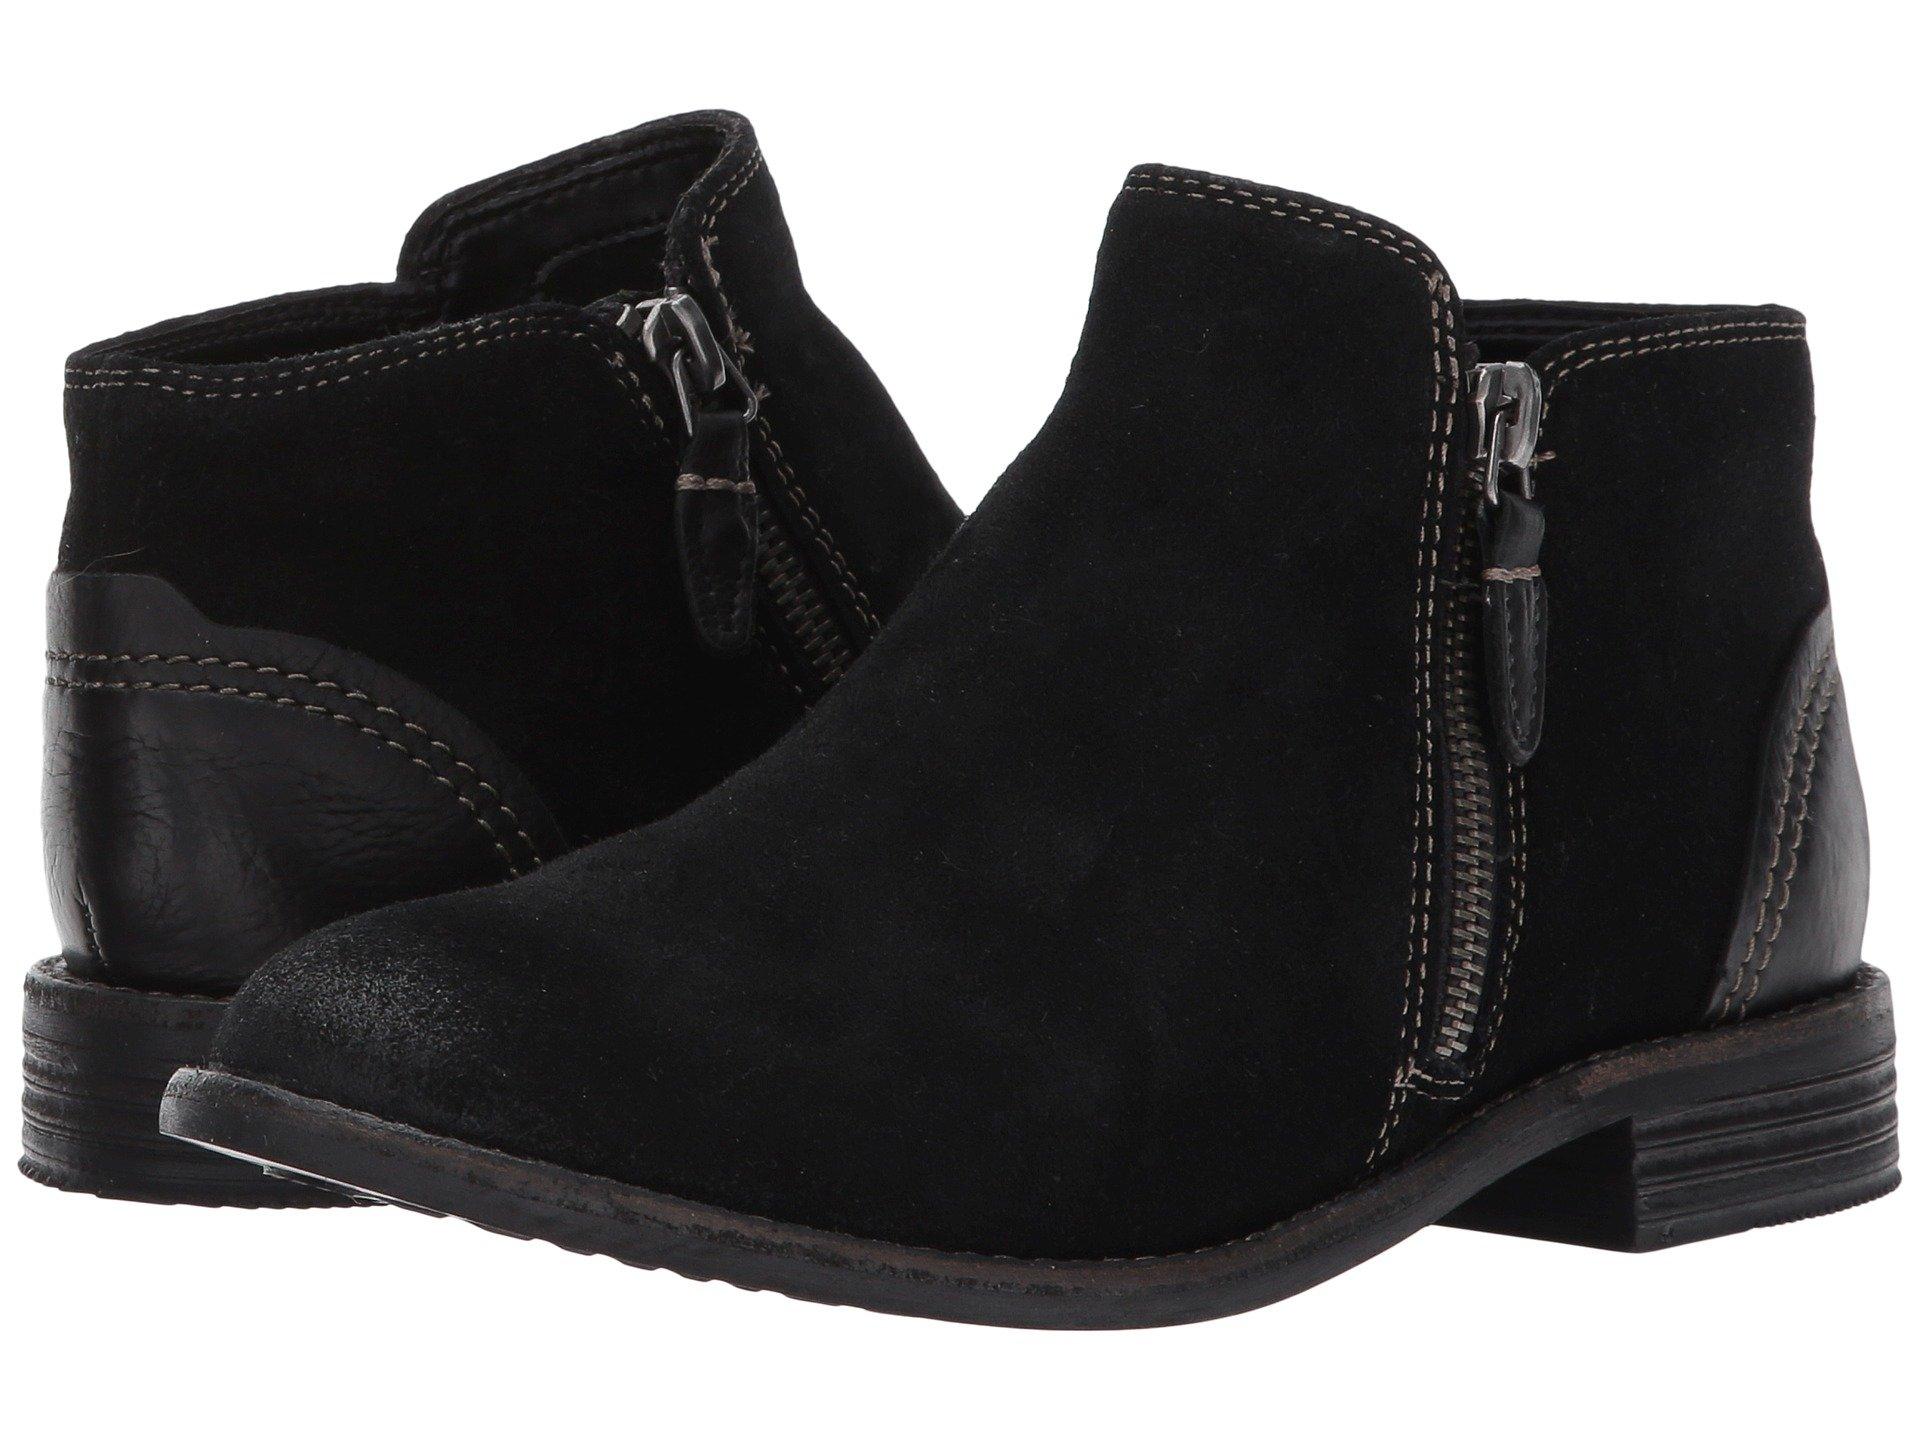 6cc24b83f92 Women s Clarks Boots + FREE SHIPPING